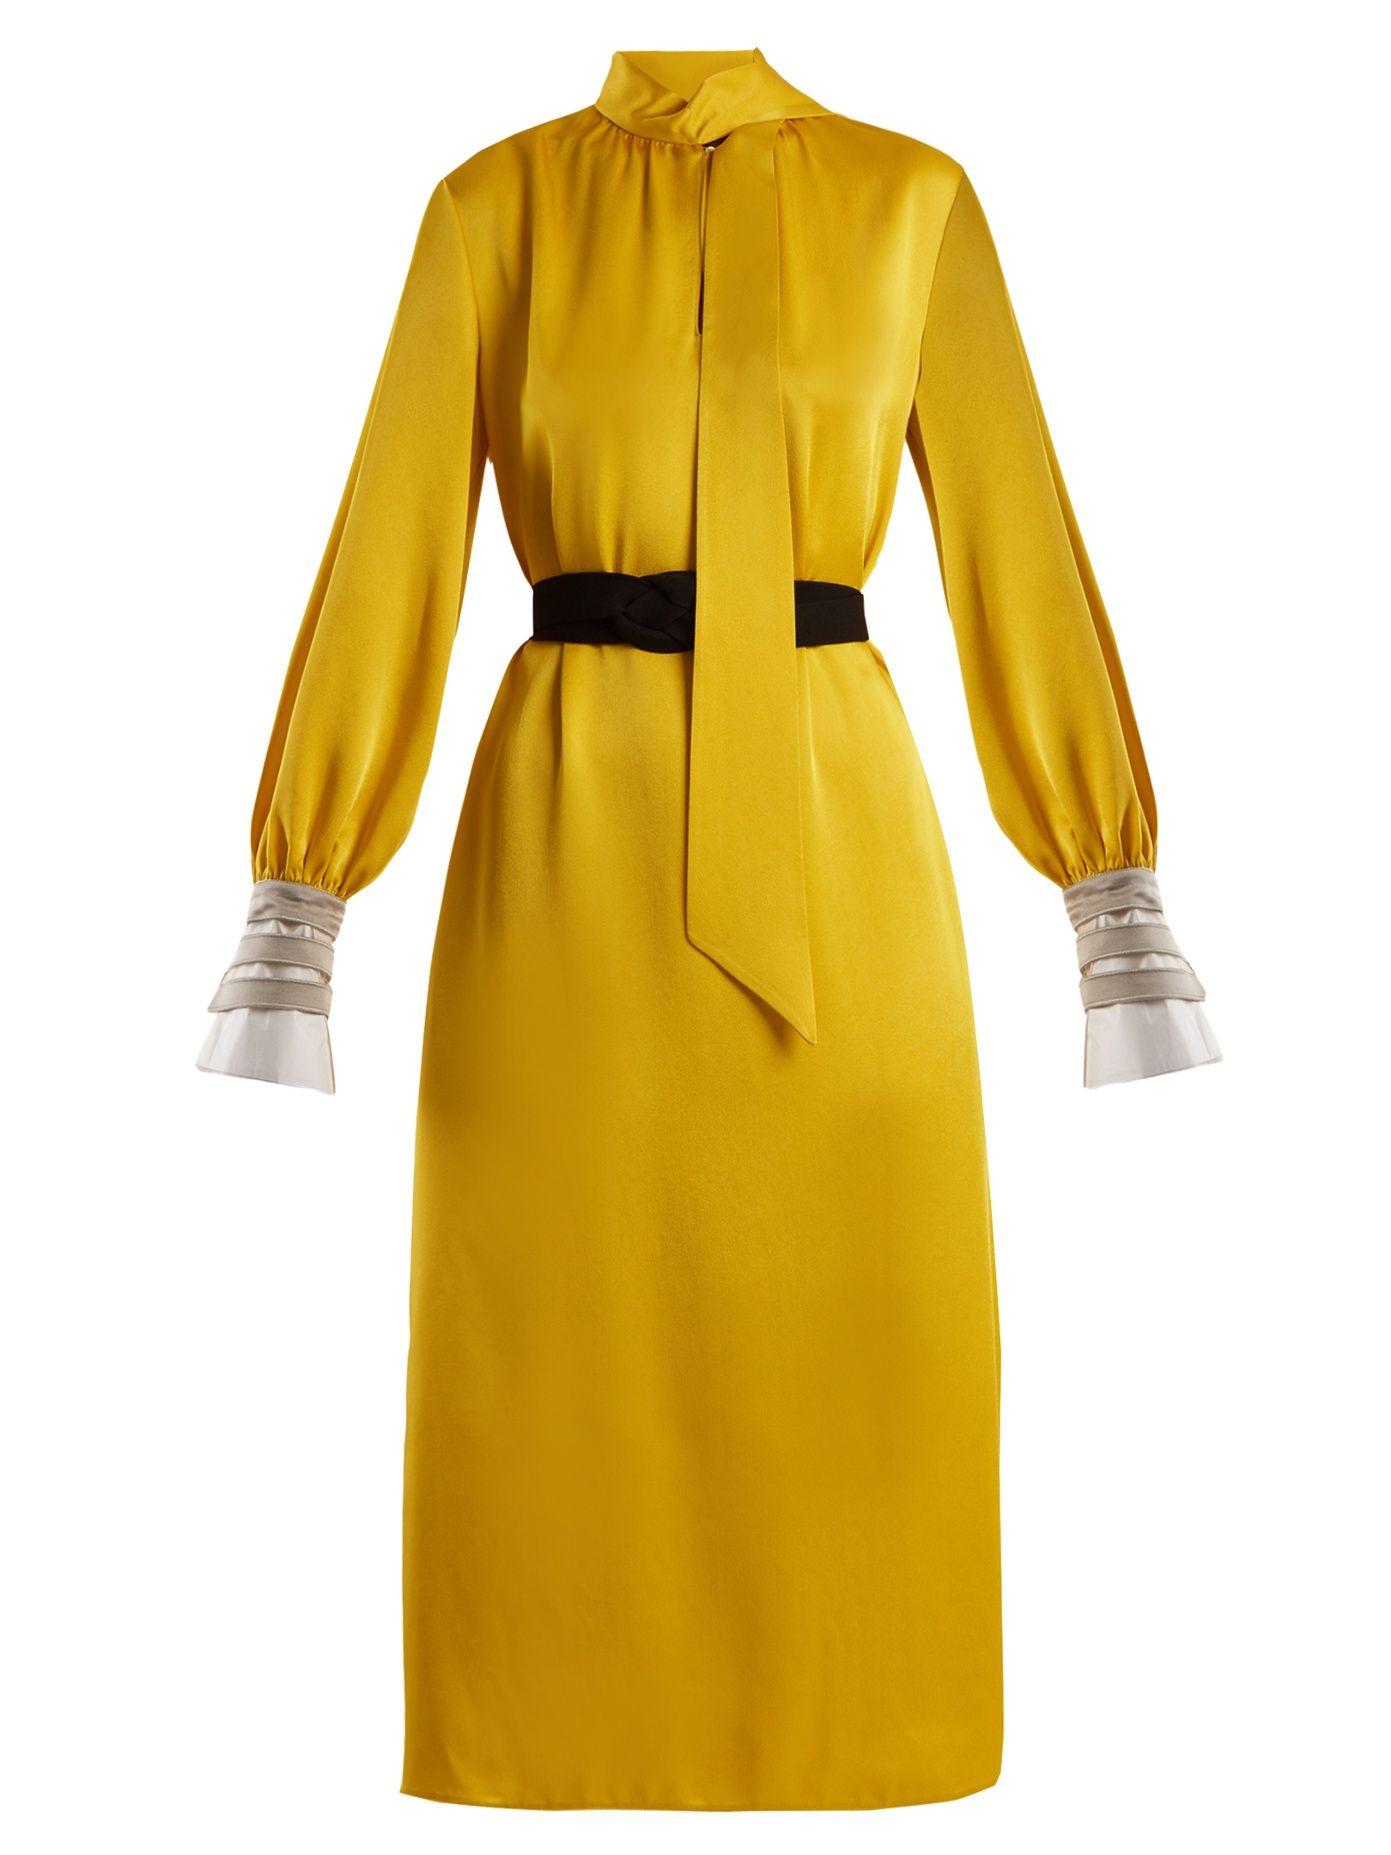 a4afa7e8f5fc Abito high-neck satin-cady midi dress